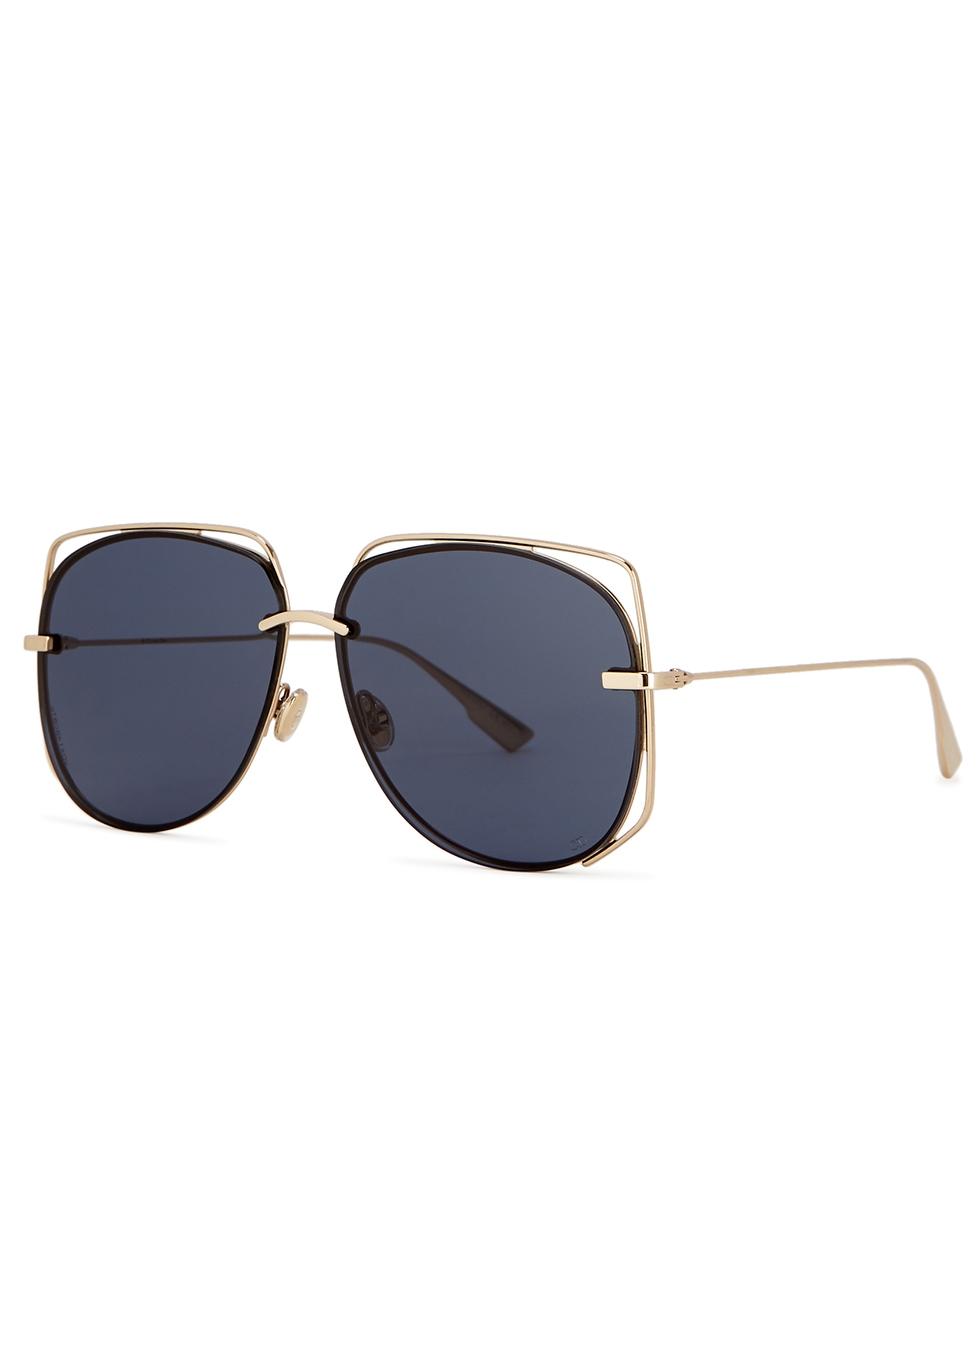 DIOR | Dior DiorStellaire6 Oval-Frame Sunglasses | Goxip